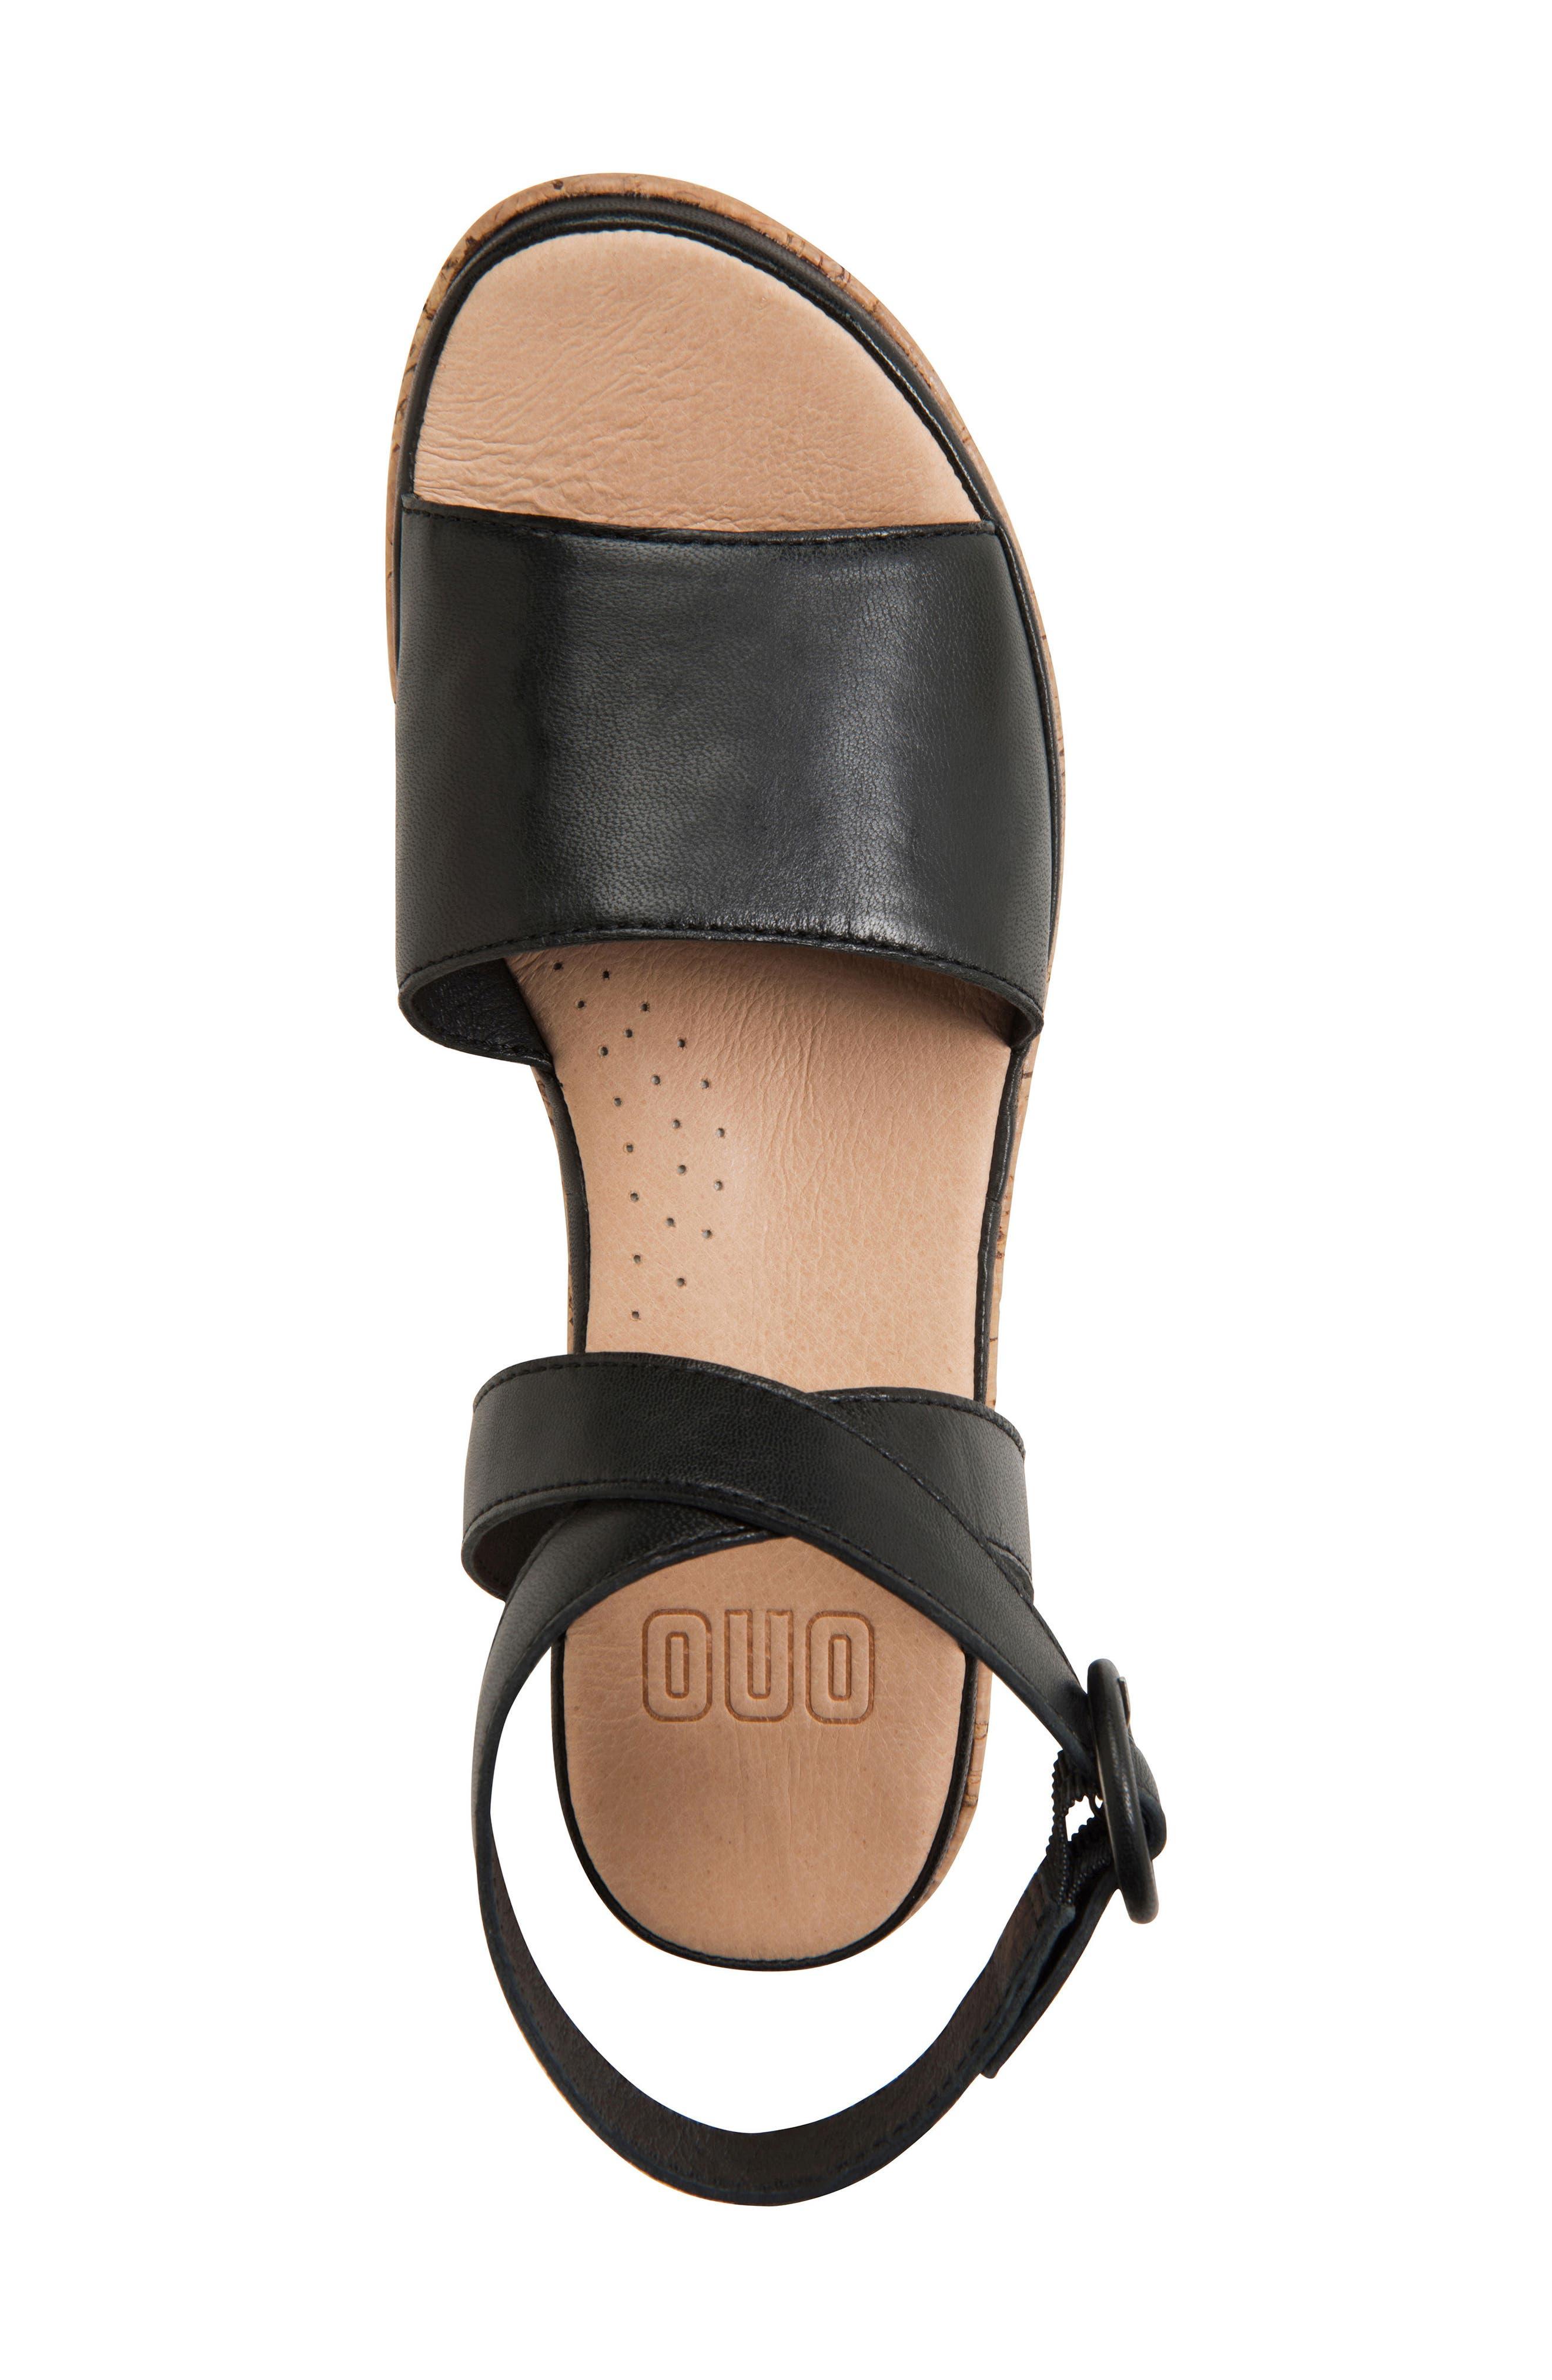 ONO, Dreamy Platform Wedge Sandal, Alternate thumbnail 5, color, BLACK LEATHER